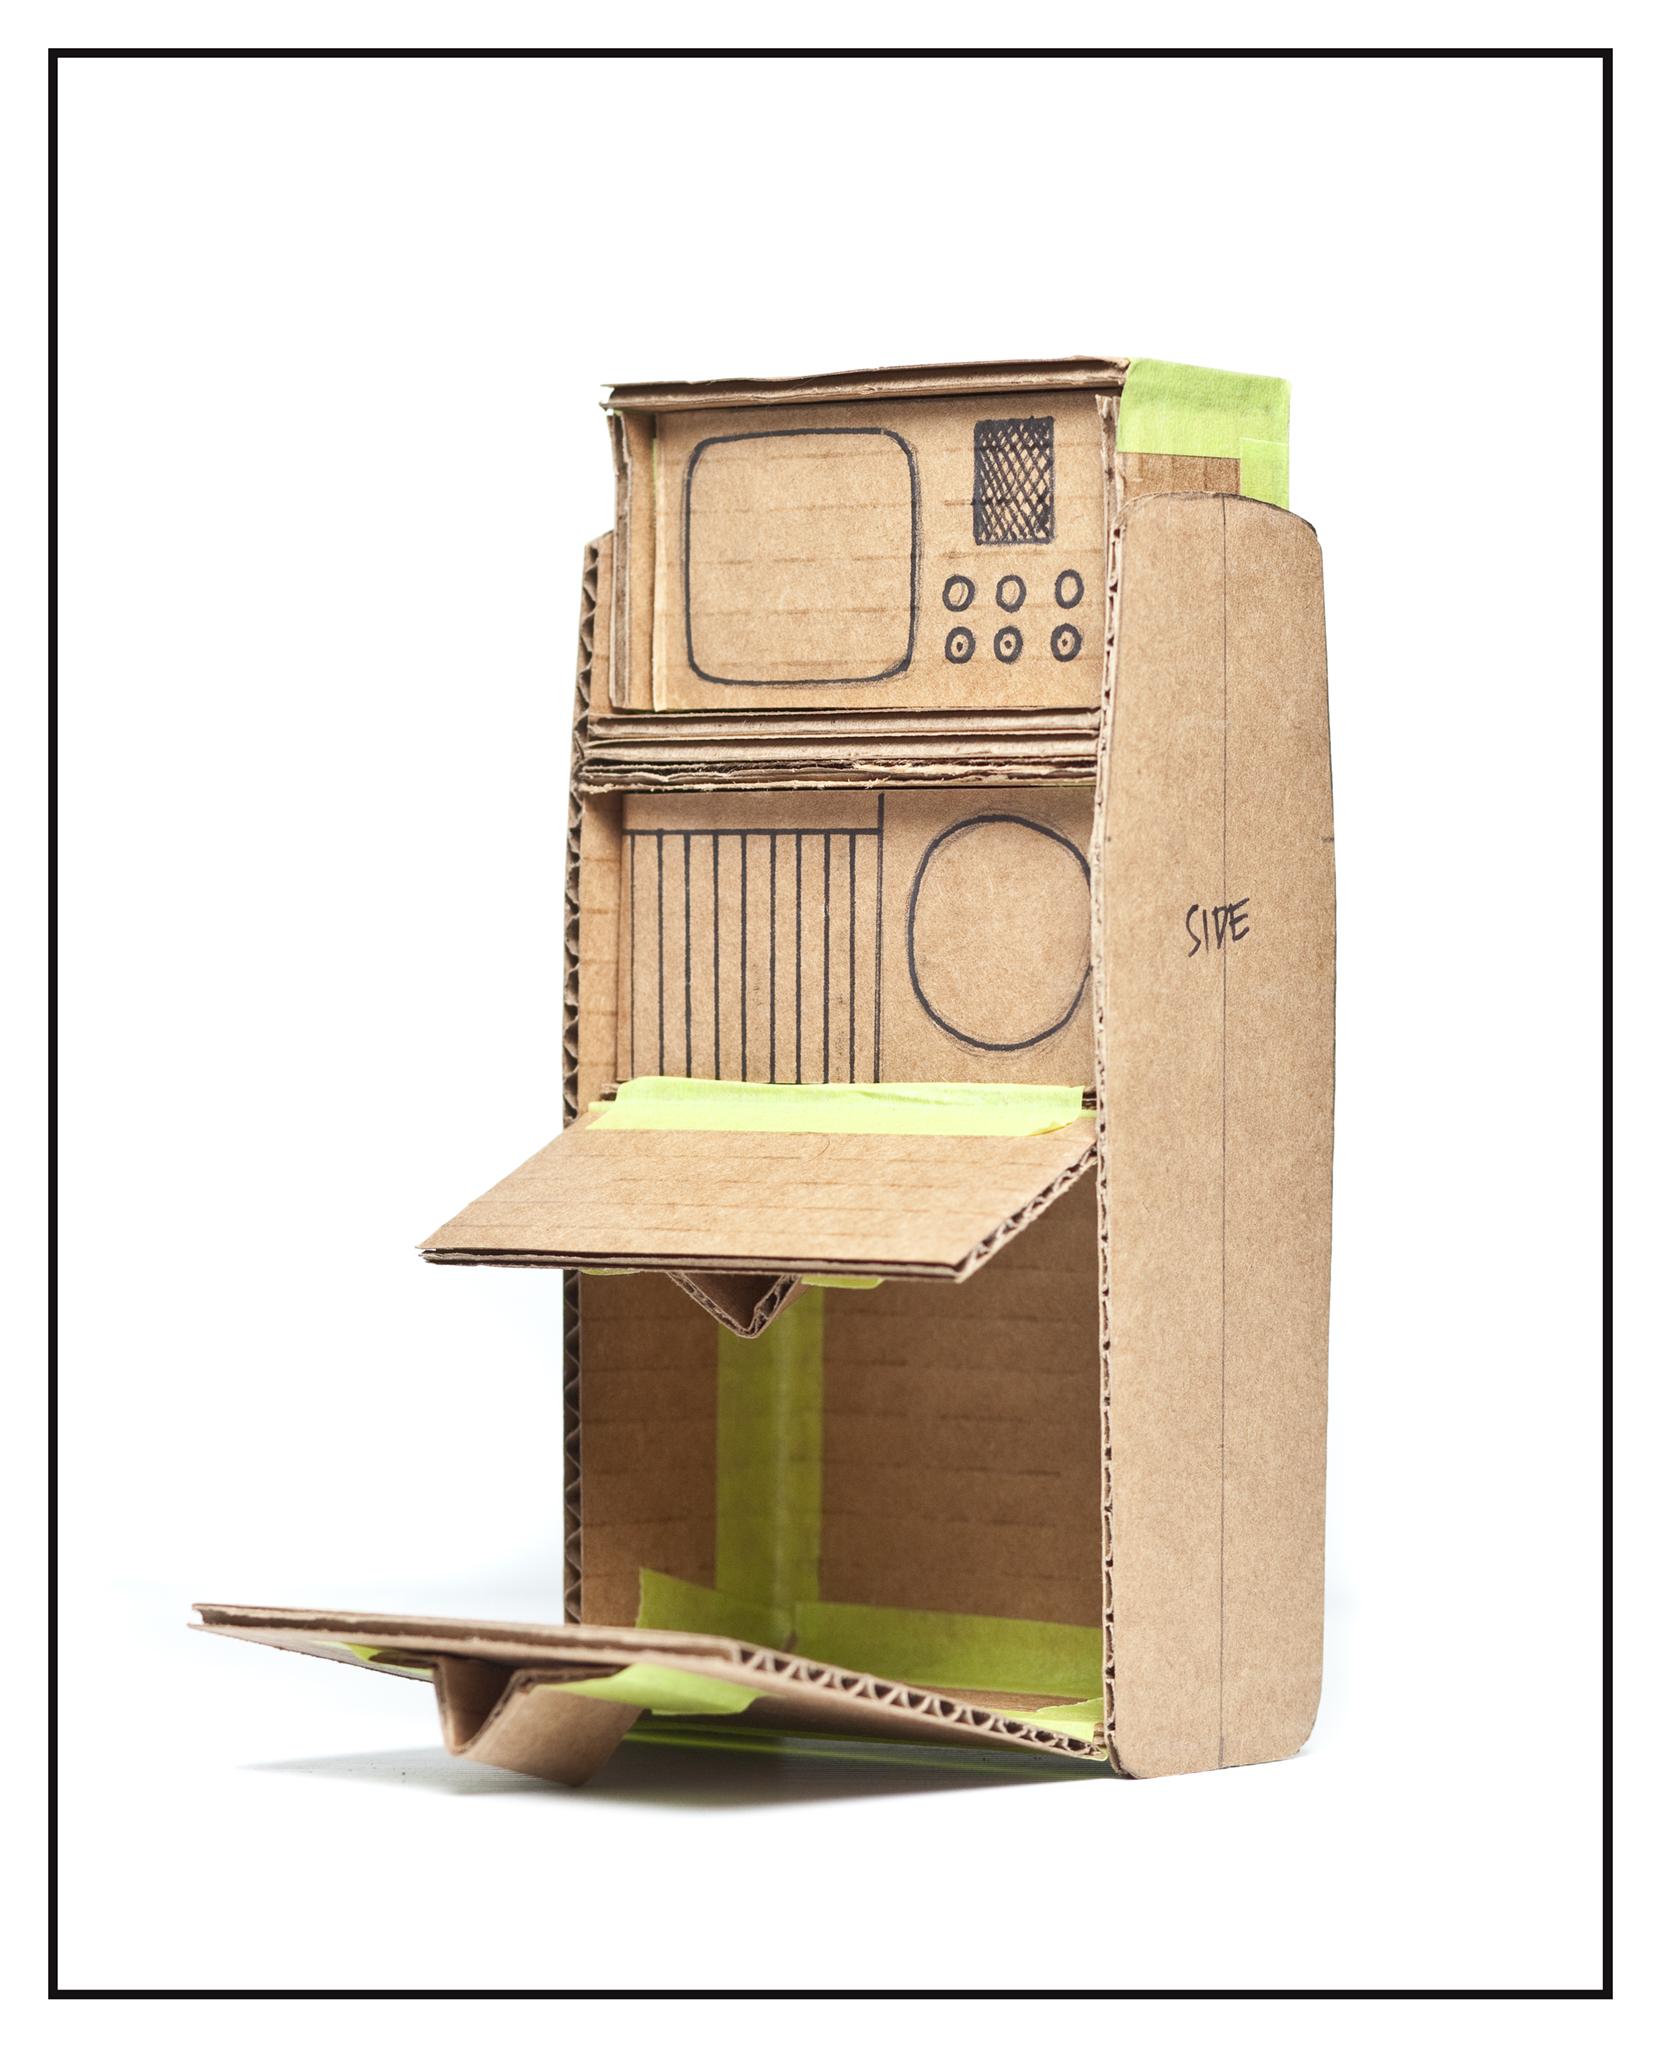 cardboardtricorder.jpg